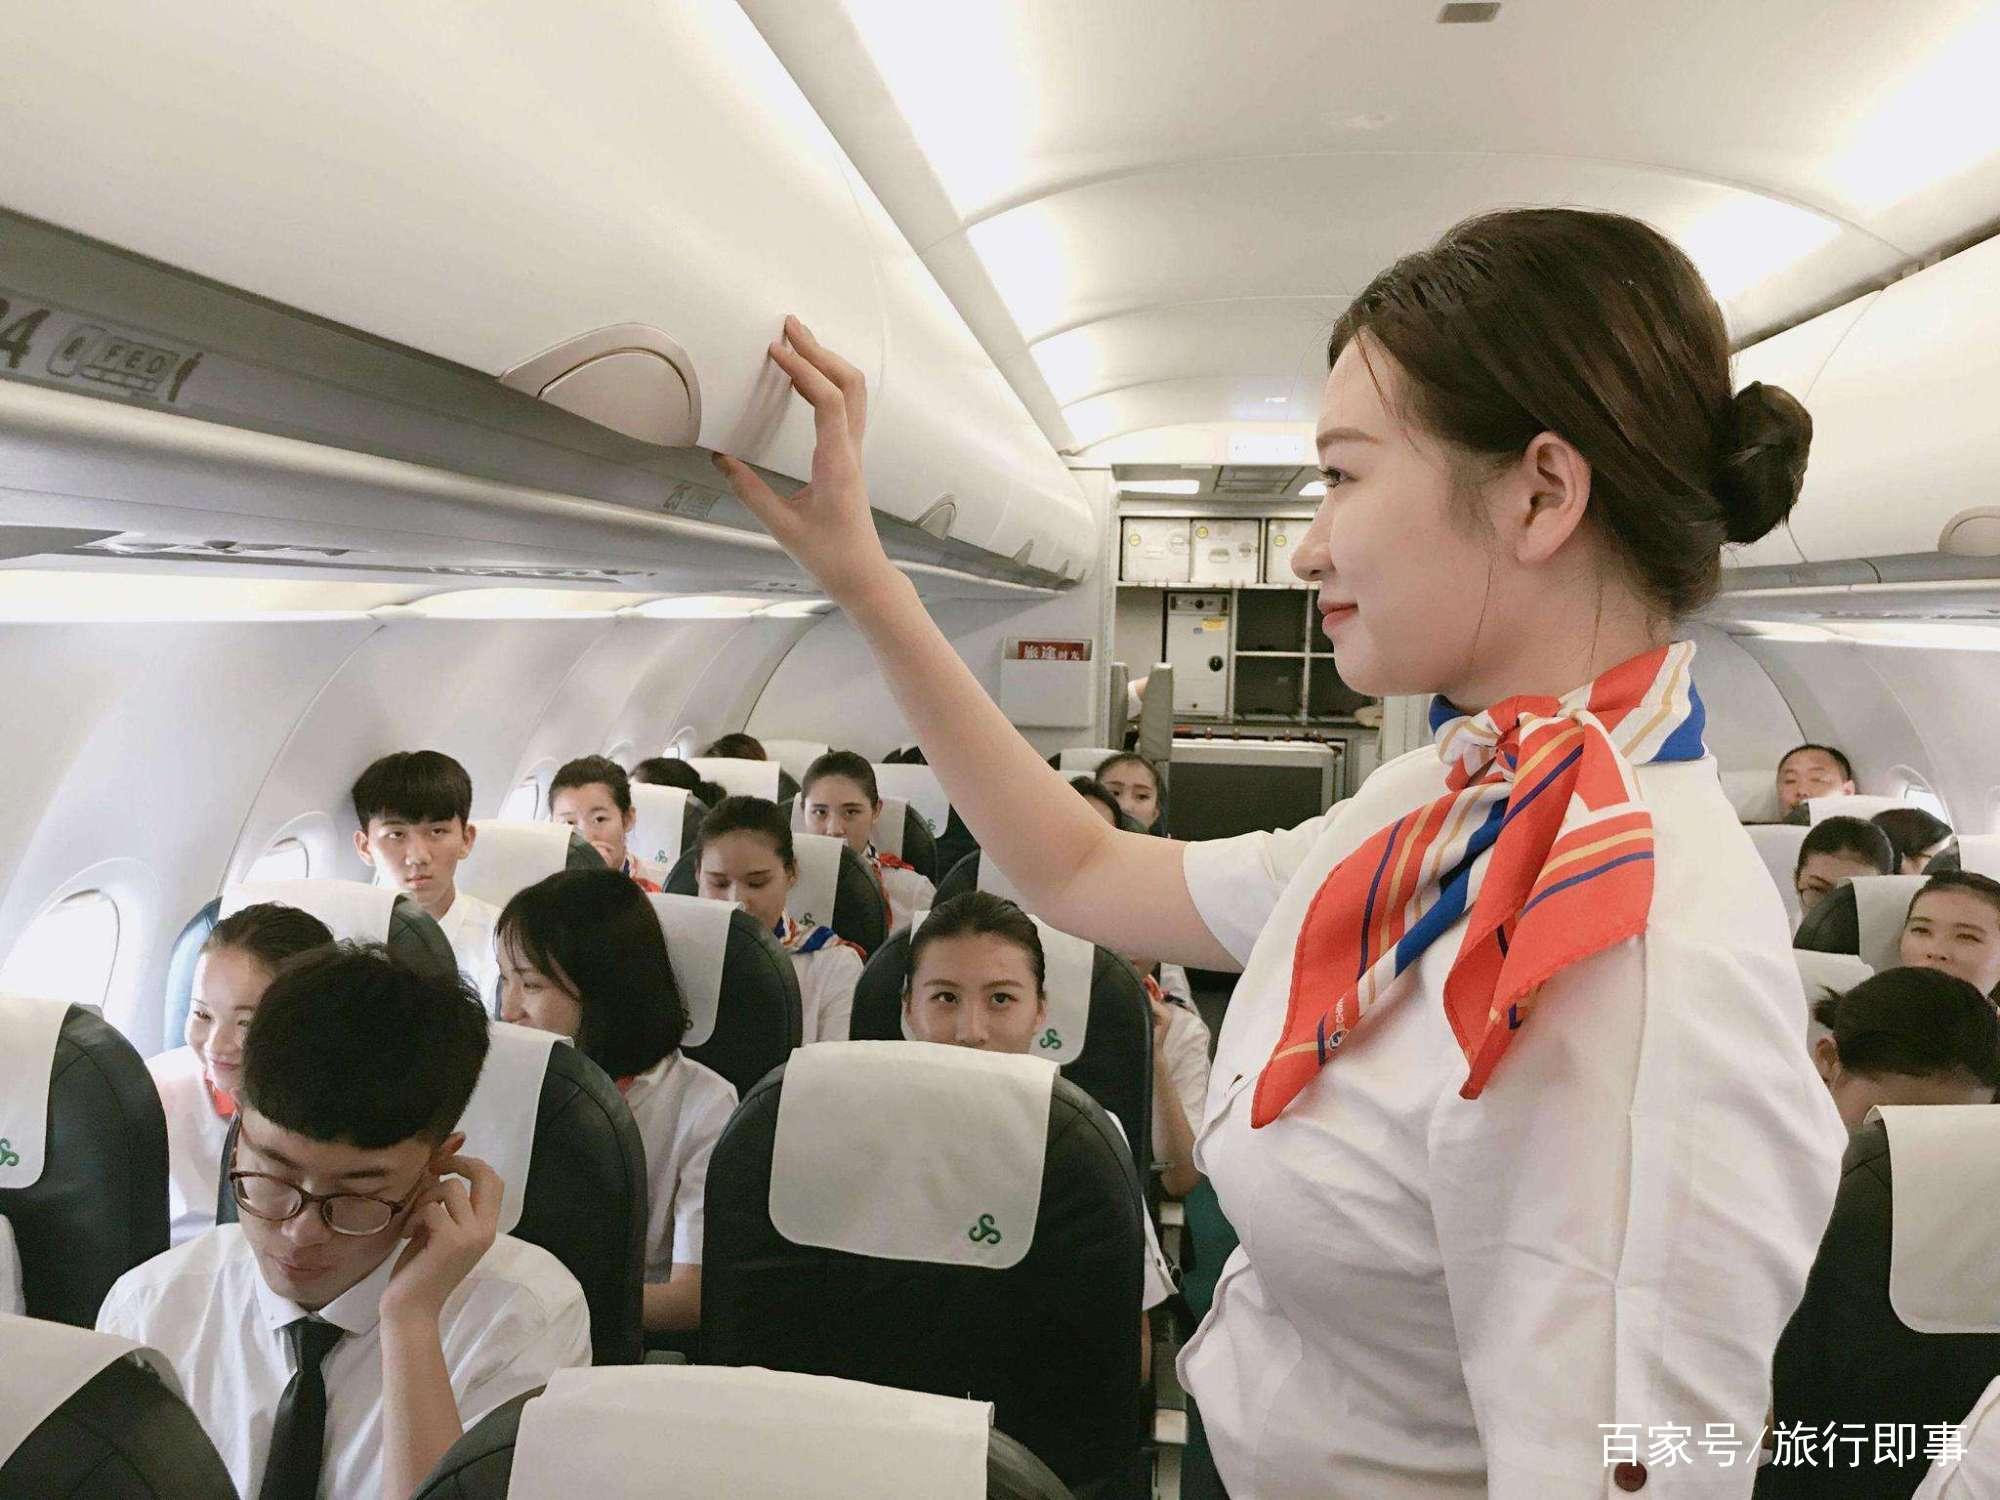 <b>外出旅游坐飞机,上面的这些座位不要选!空姐说出其中的原因</b>